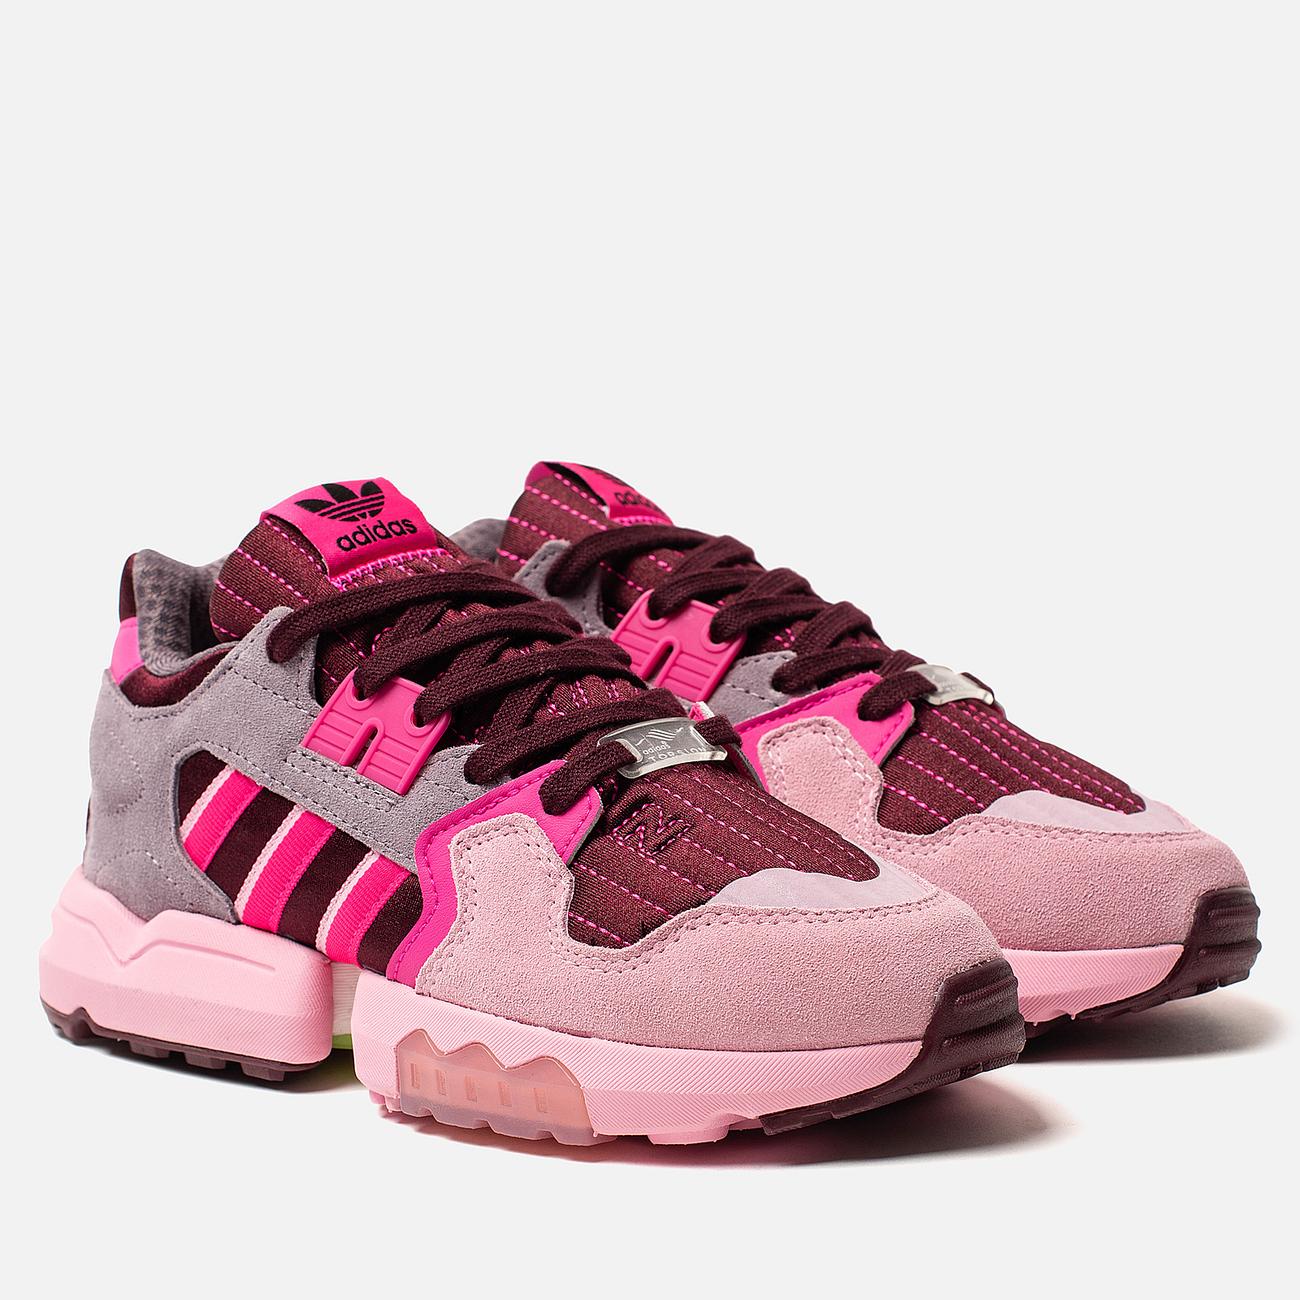 Женские кроссовки adidas Originals ZX Torsion Maroon/Shock Pink/True Pink